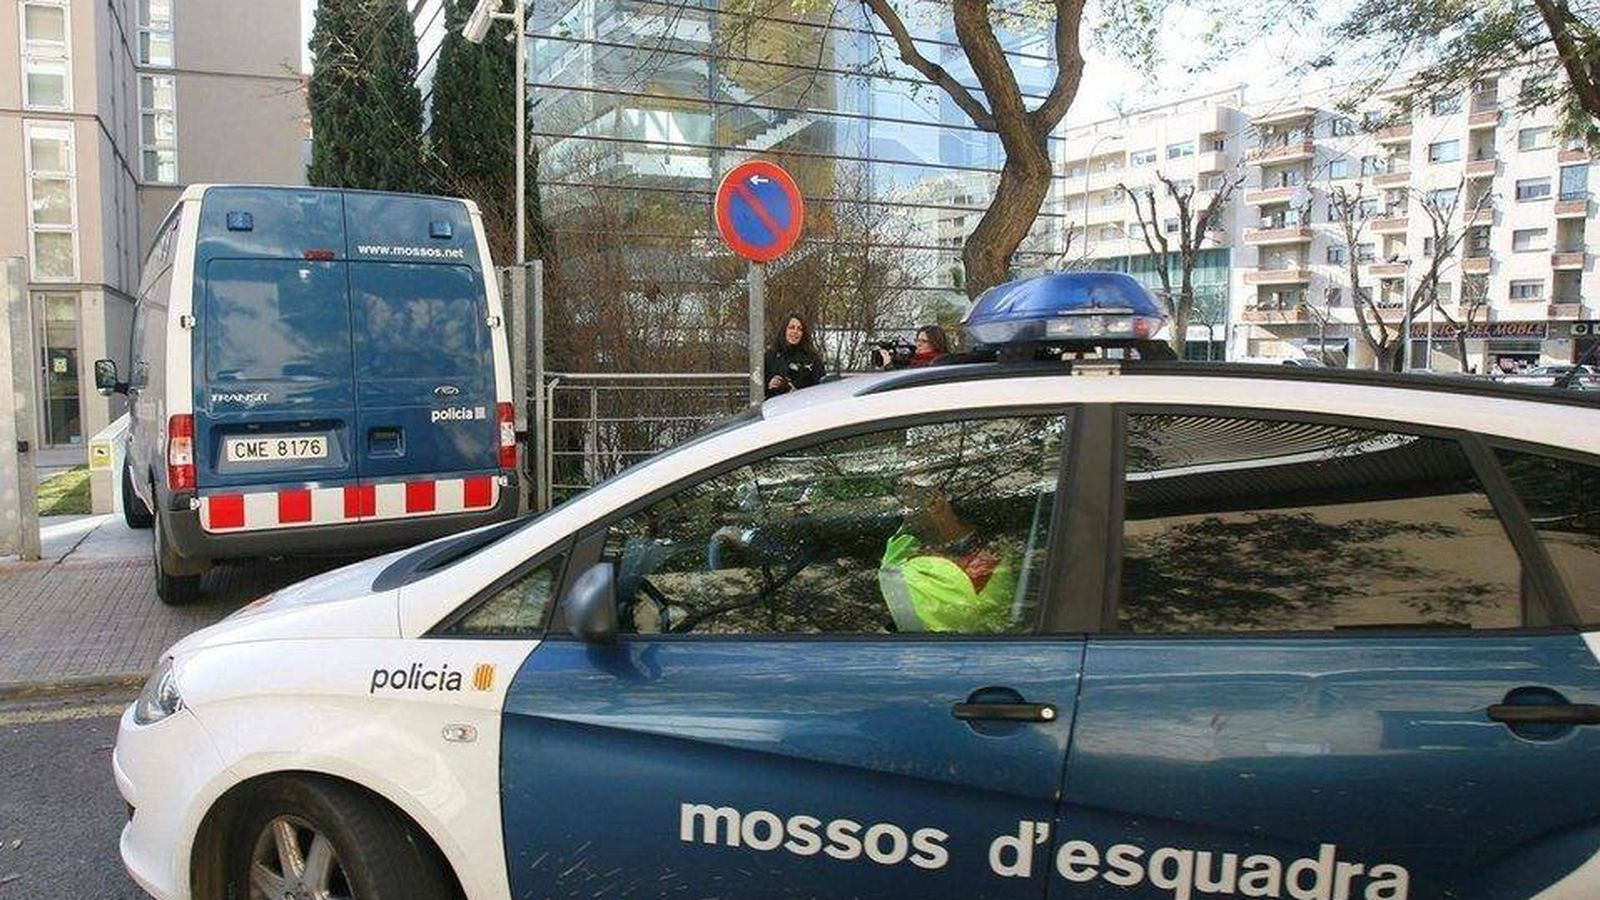 Foto: Un coche de los Mossos d'Esquadra - Archivo. (EFE)